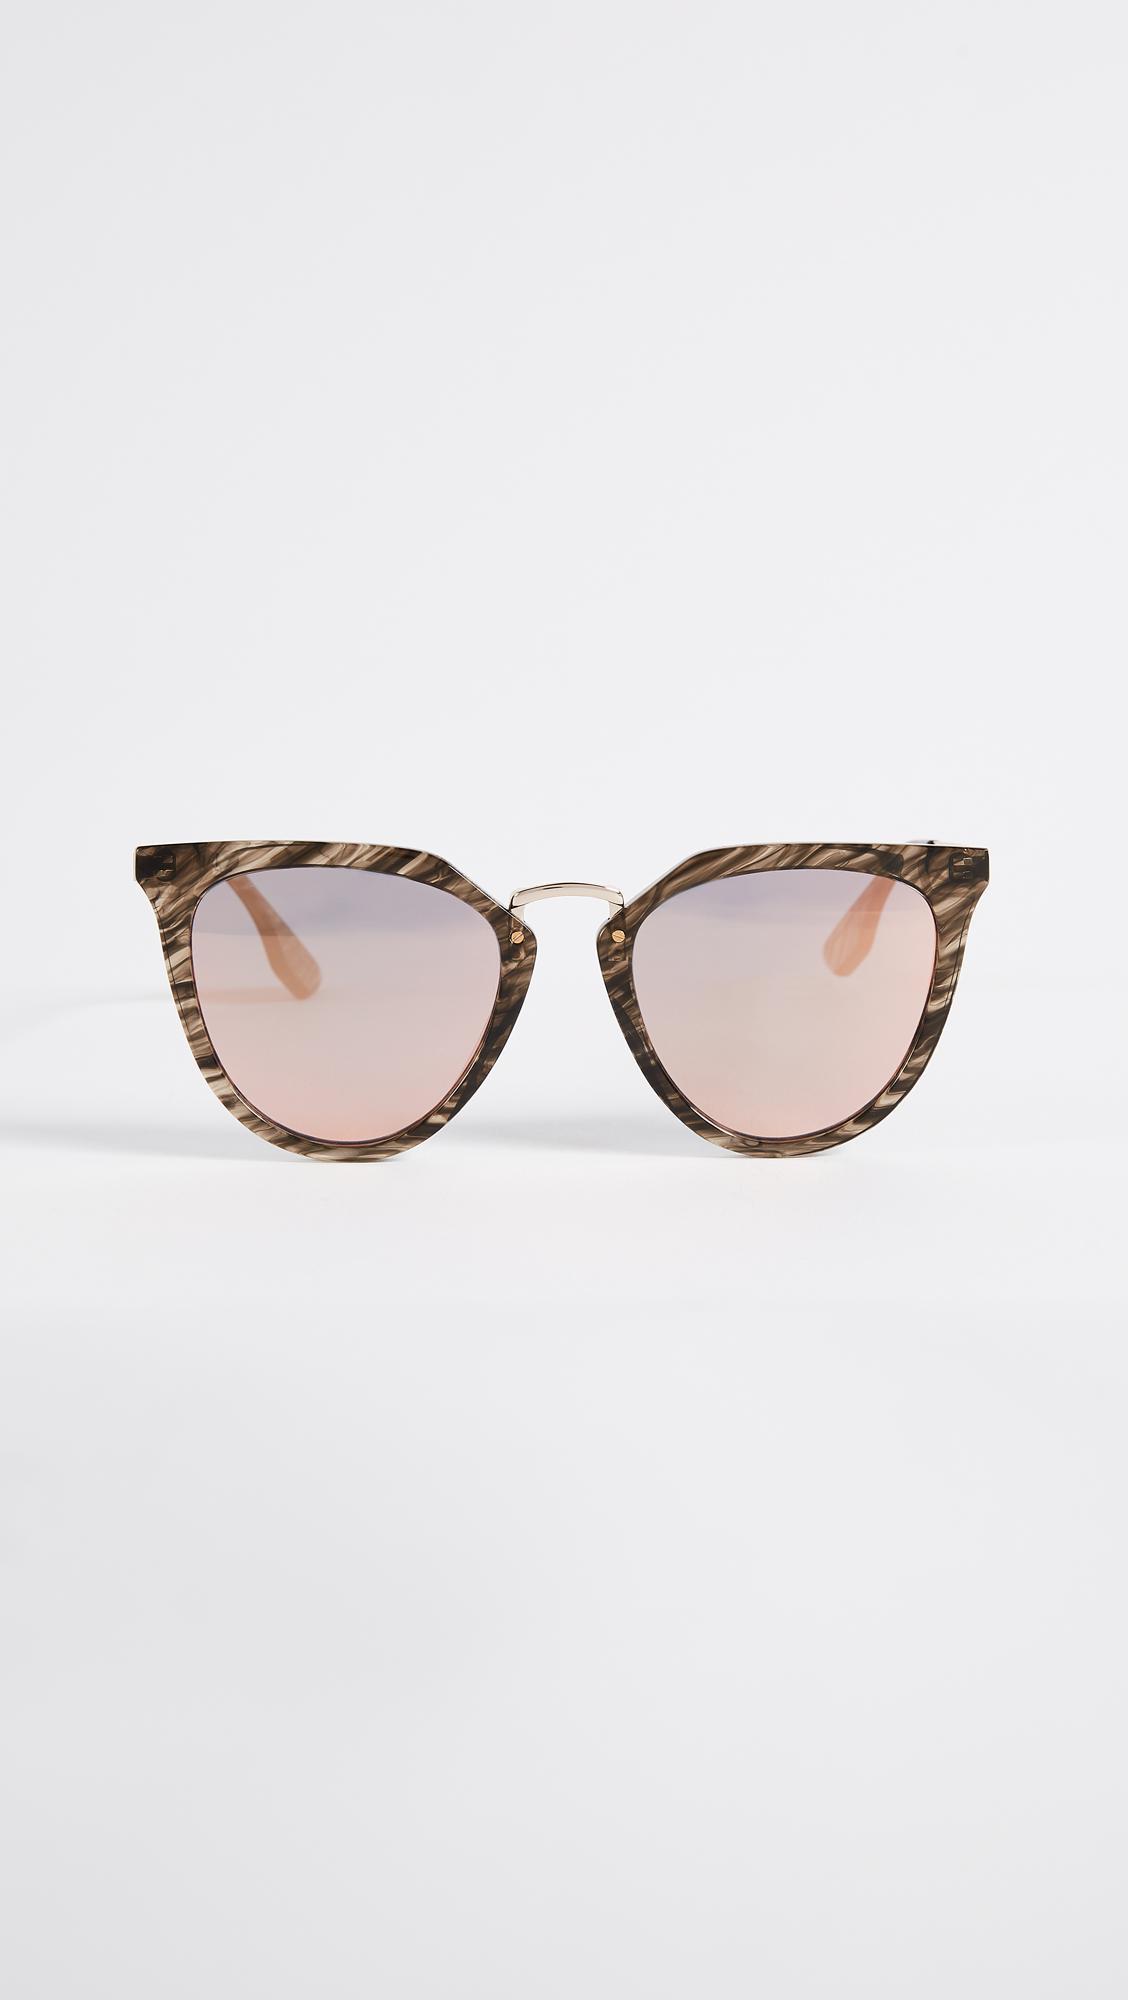 McQ Discord Edgy Cat Eye Sunglasses - Lyst